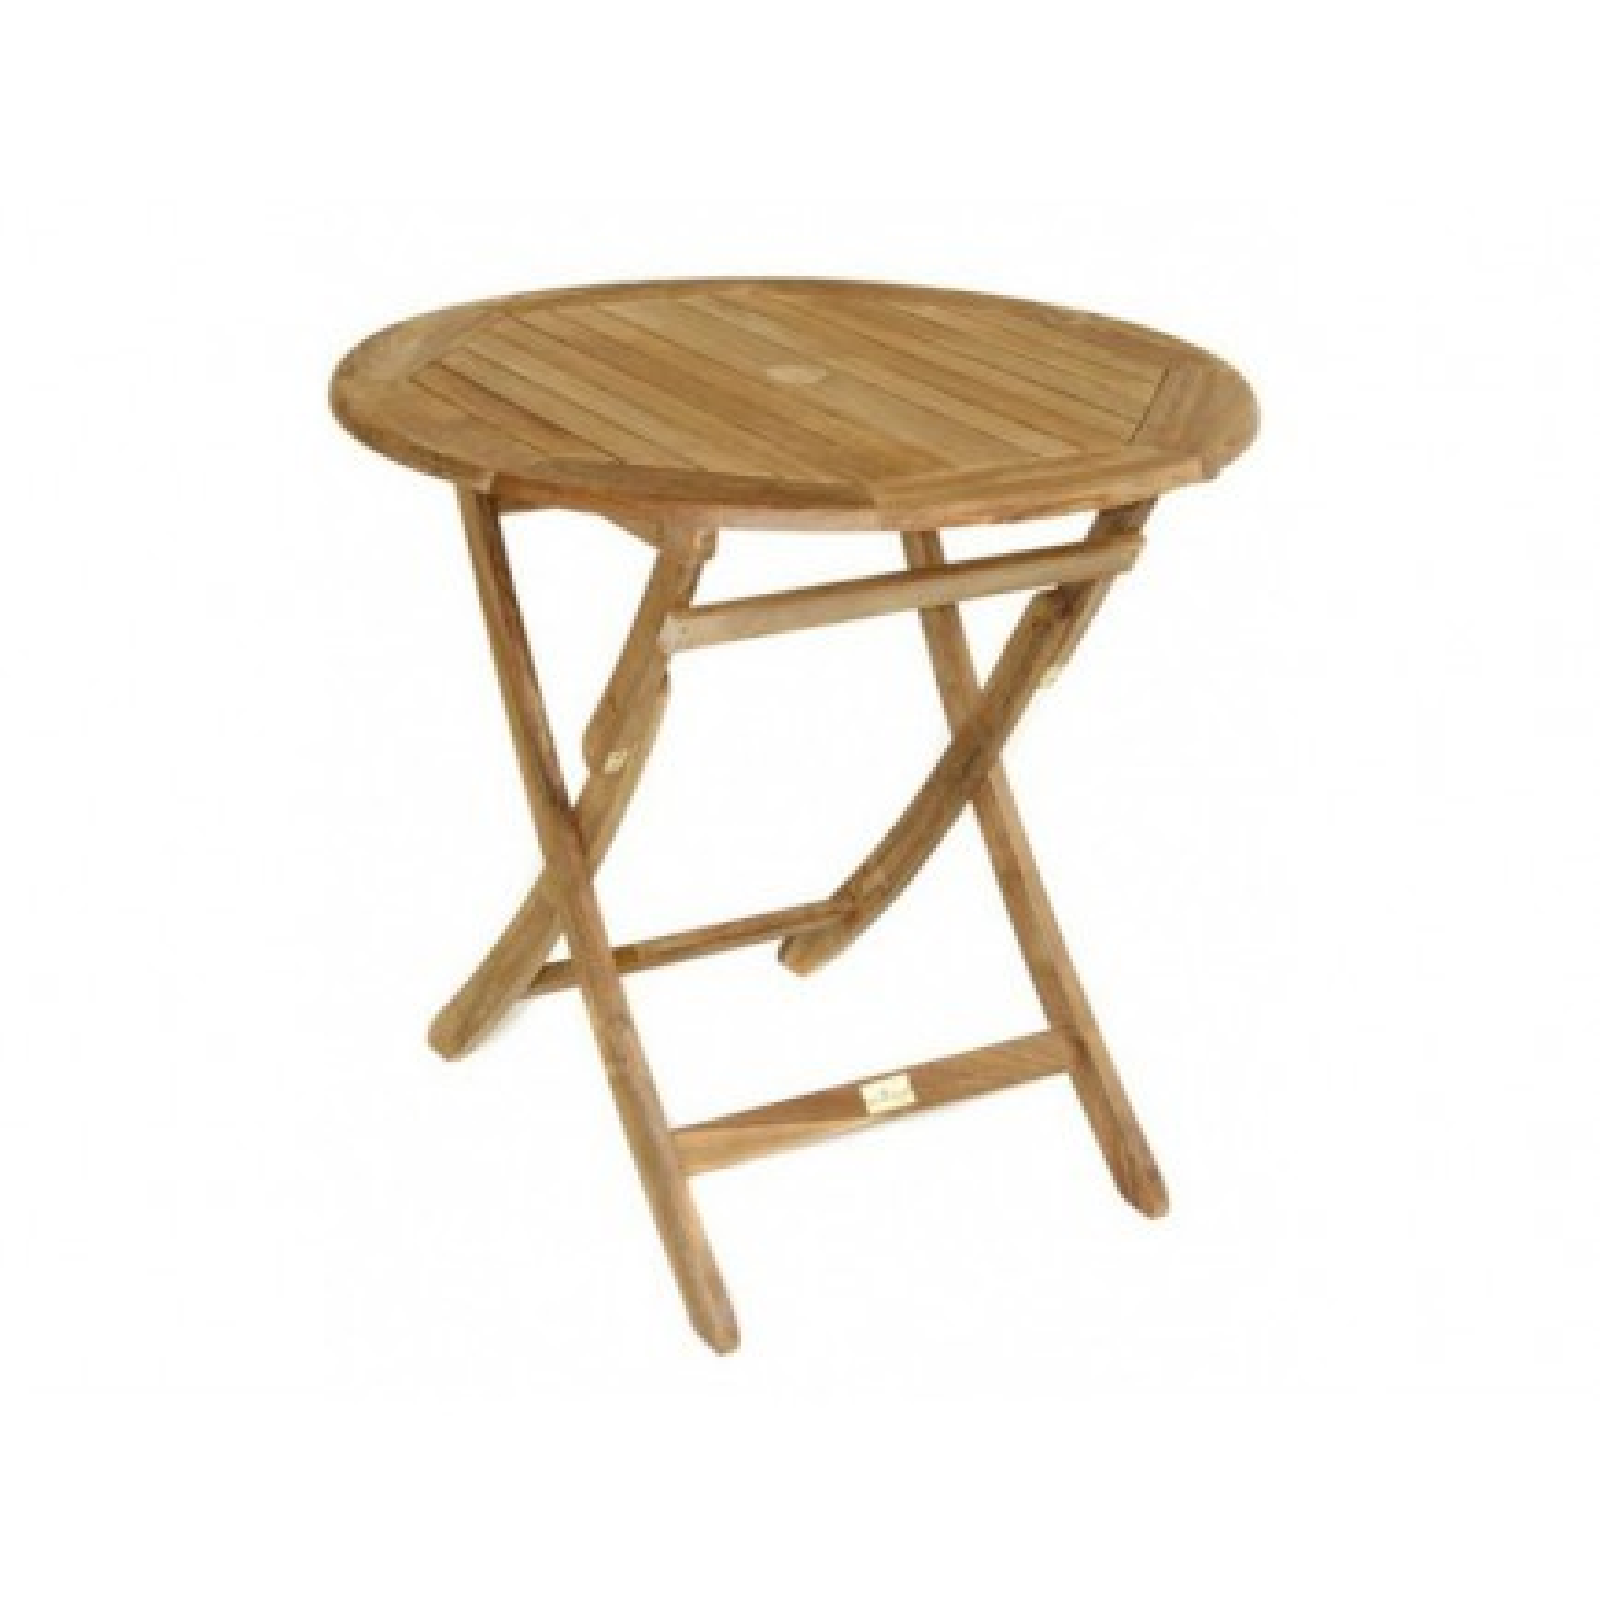 Table De Repas Ronde Pliante Taman Teck Recyclé - meuble de jardin